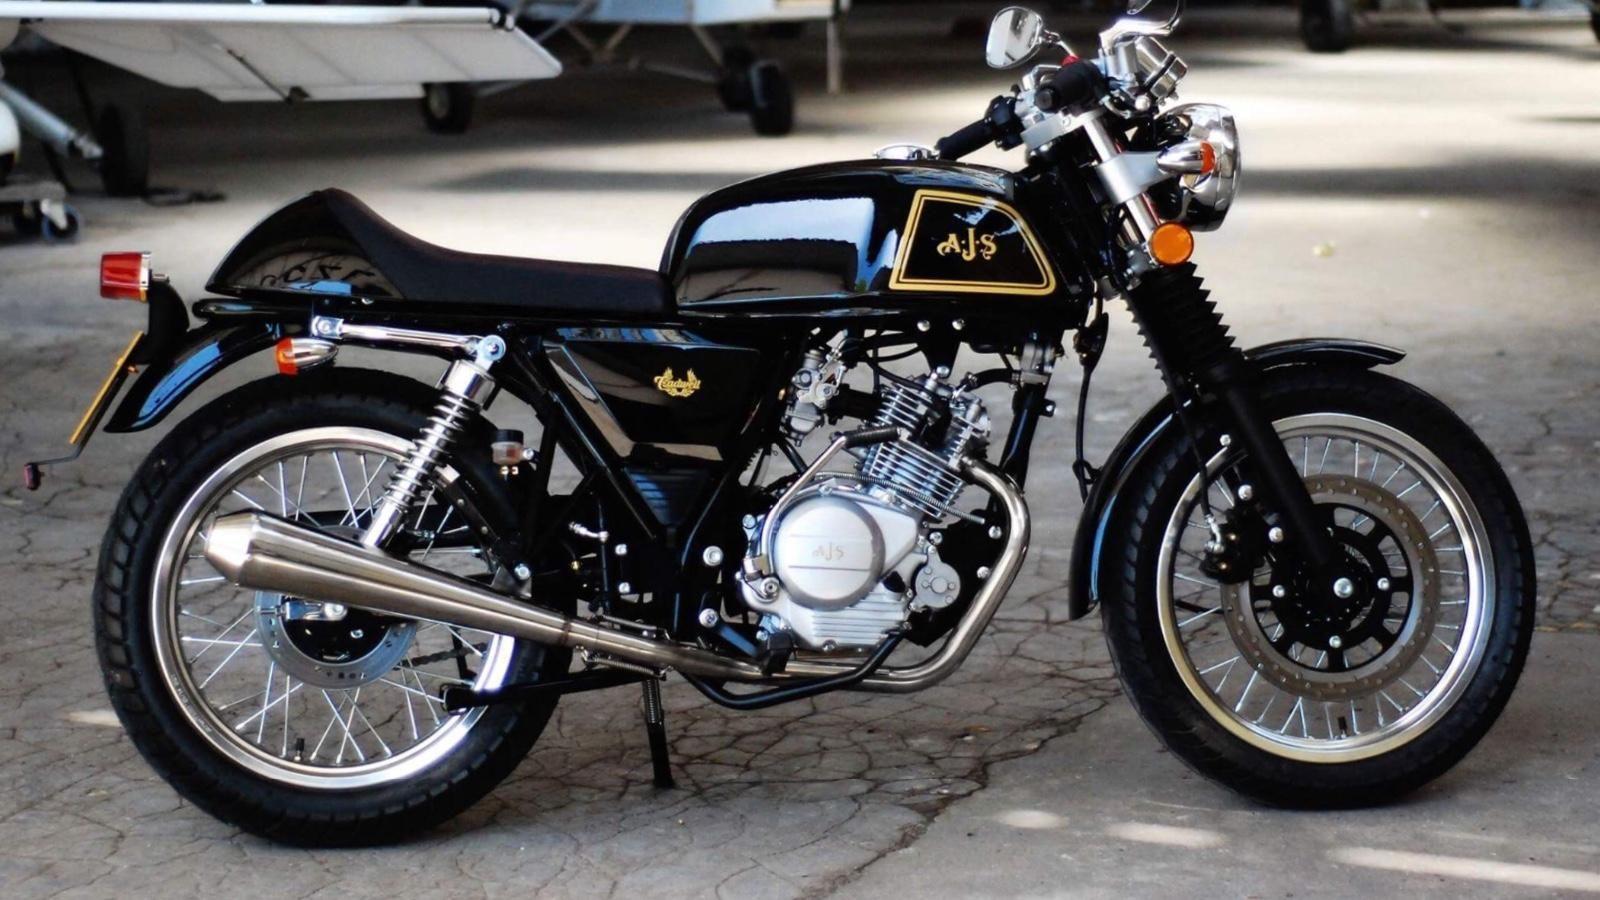 Ajs Cadwell 125 2016 125 Cafe Racer Cafe Racer Cafe Racer Motorcycle